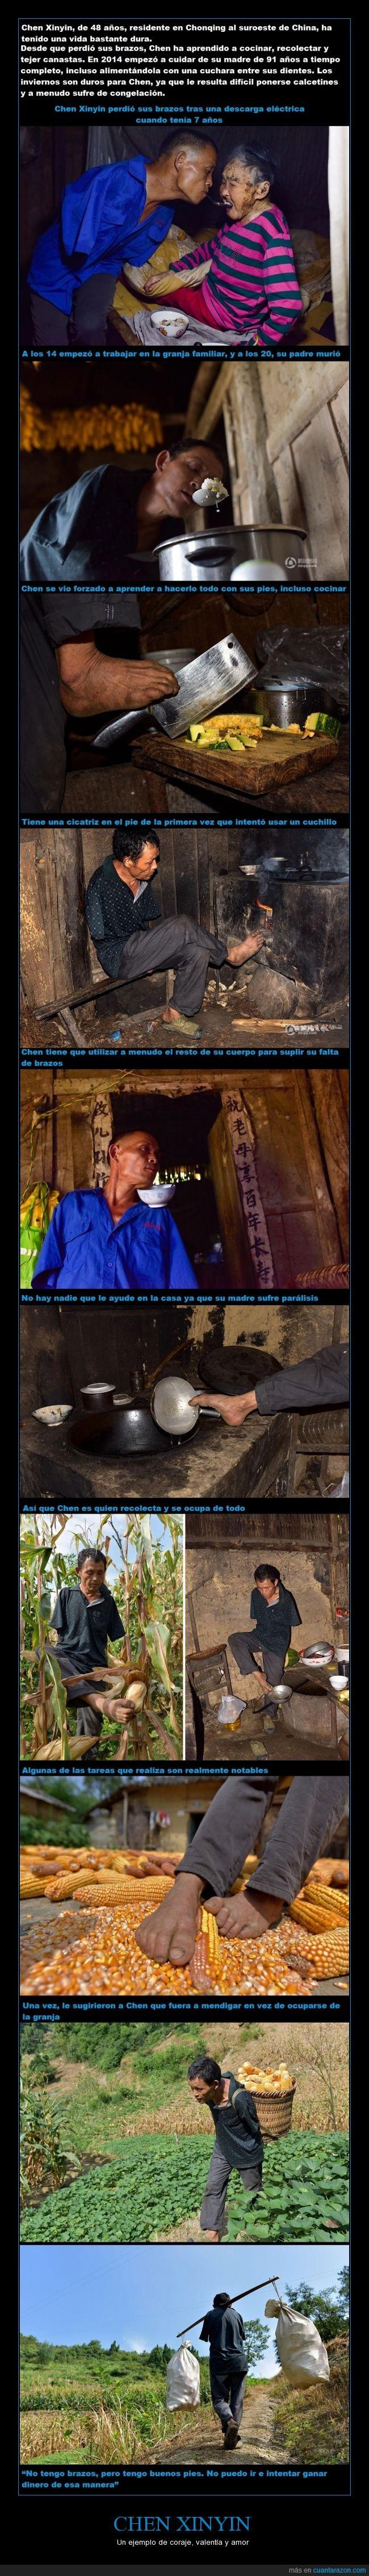 ayudar,brazos,CHEN XINYIN,china,chino,madre,maiz,movilidad